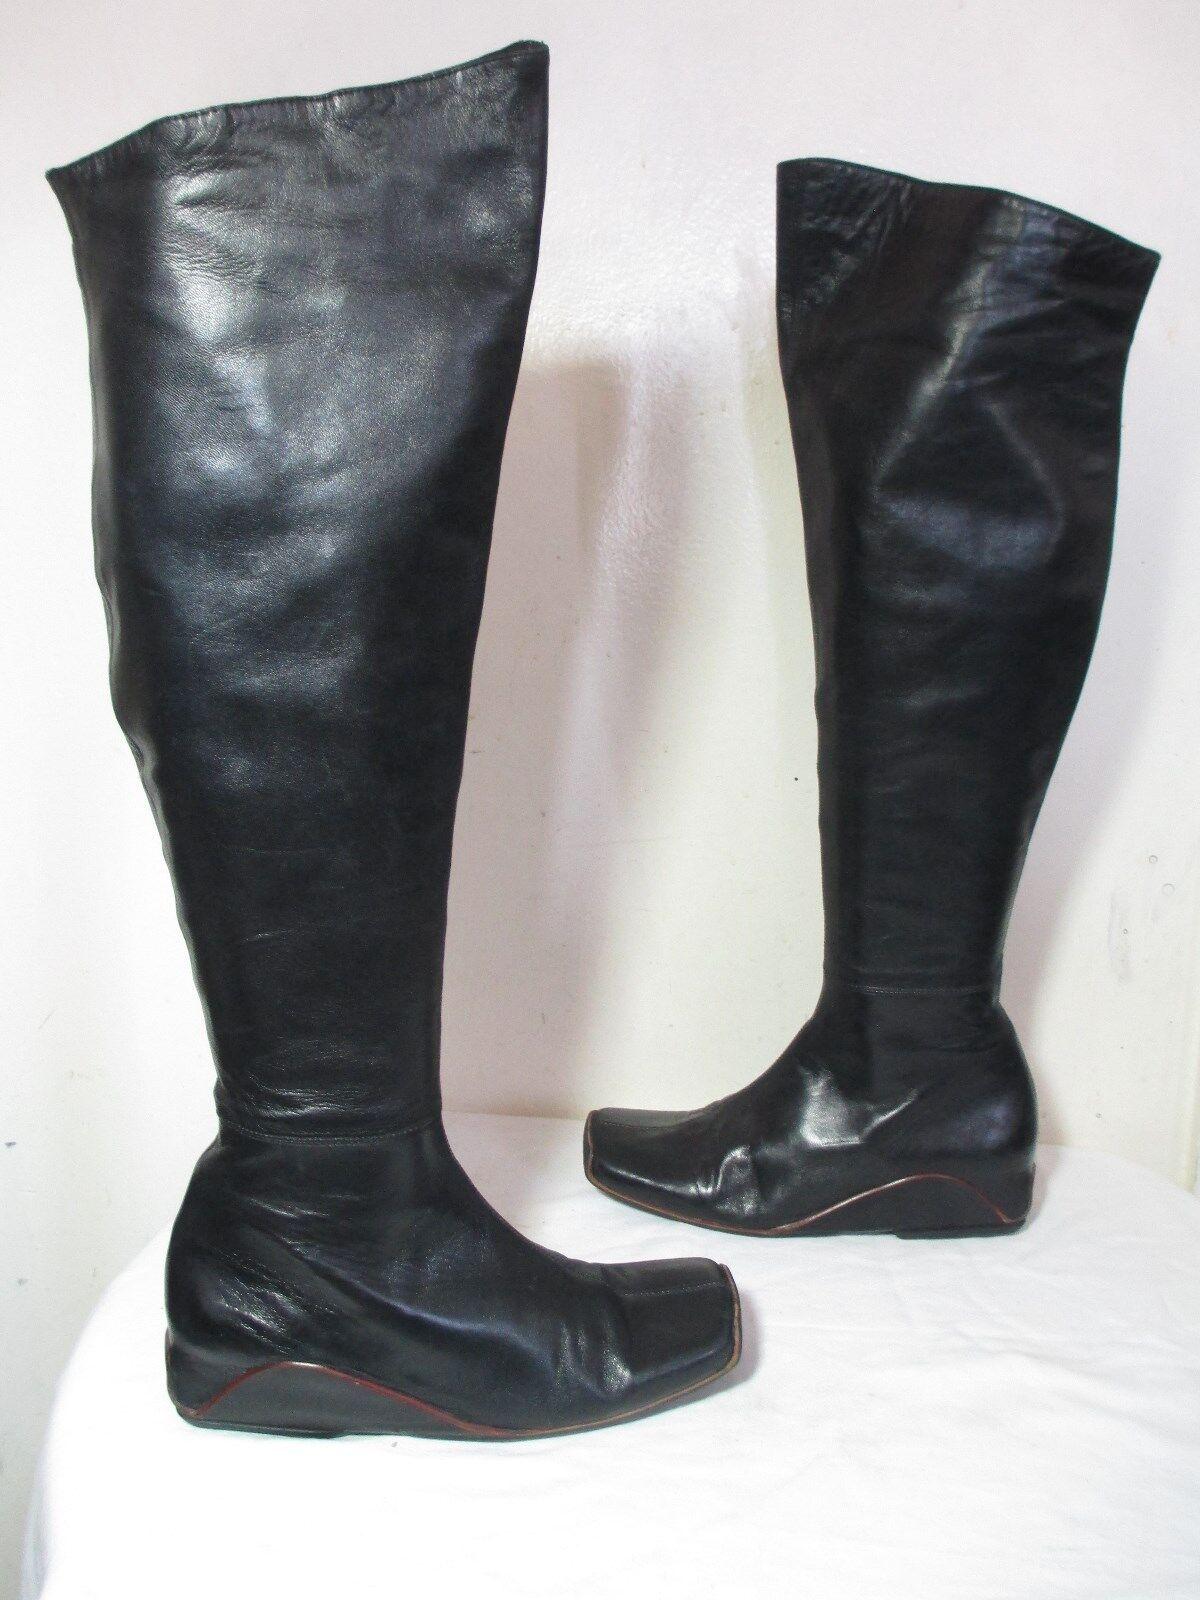 ROBERT CLERGERIE BLACK SOFT LEATHER FASHION KNEE KNEE KNEE HIGH HIDDEN WEDGE BOOTS 6½ B b235fb